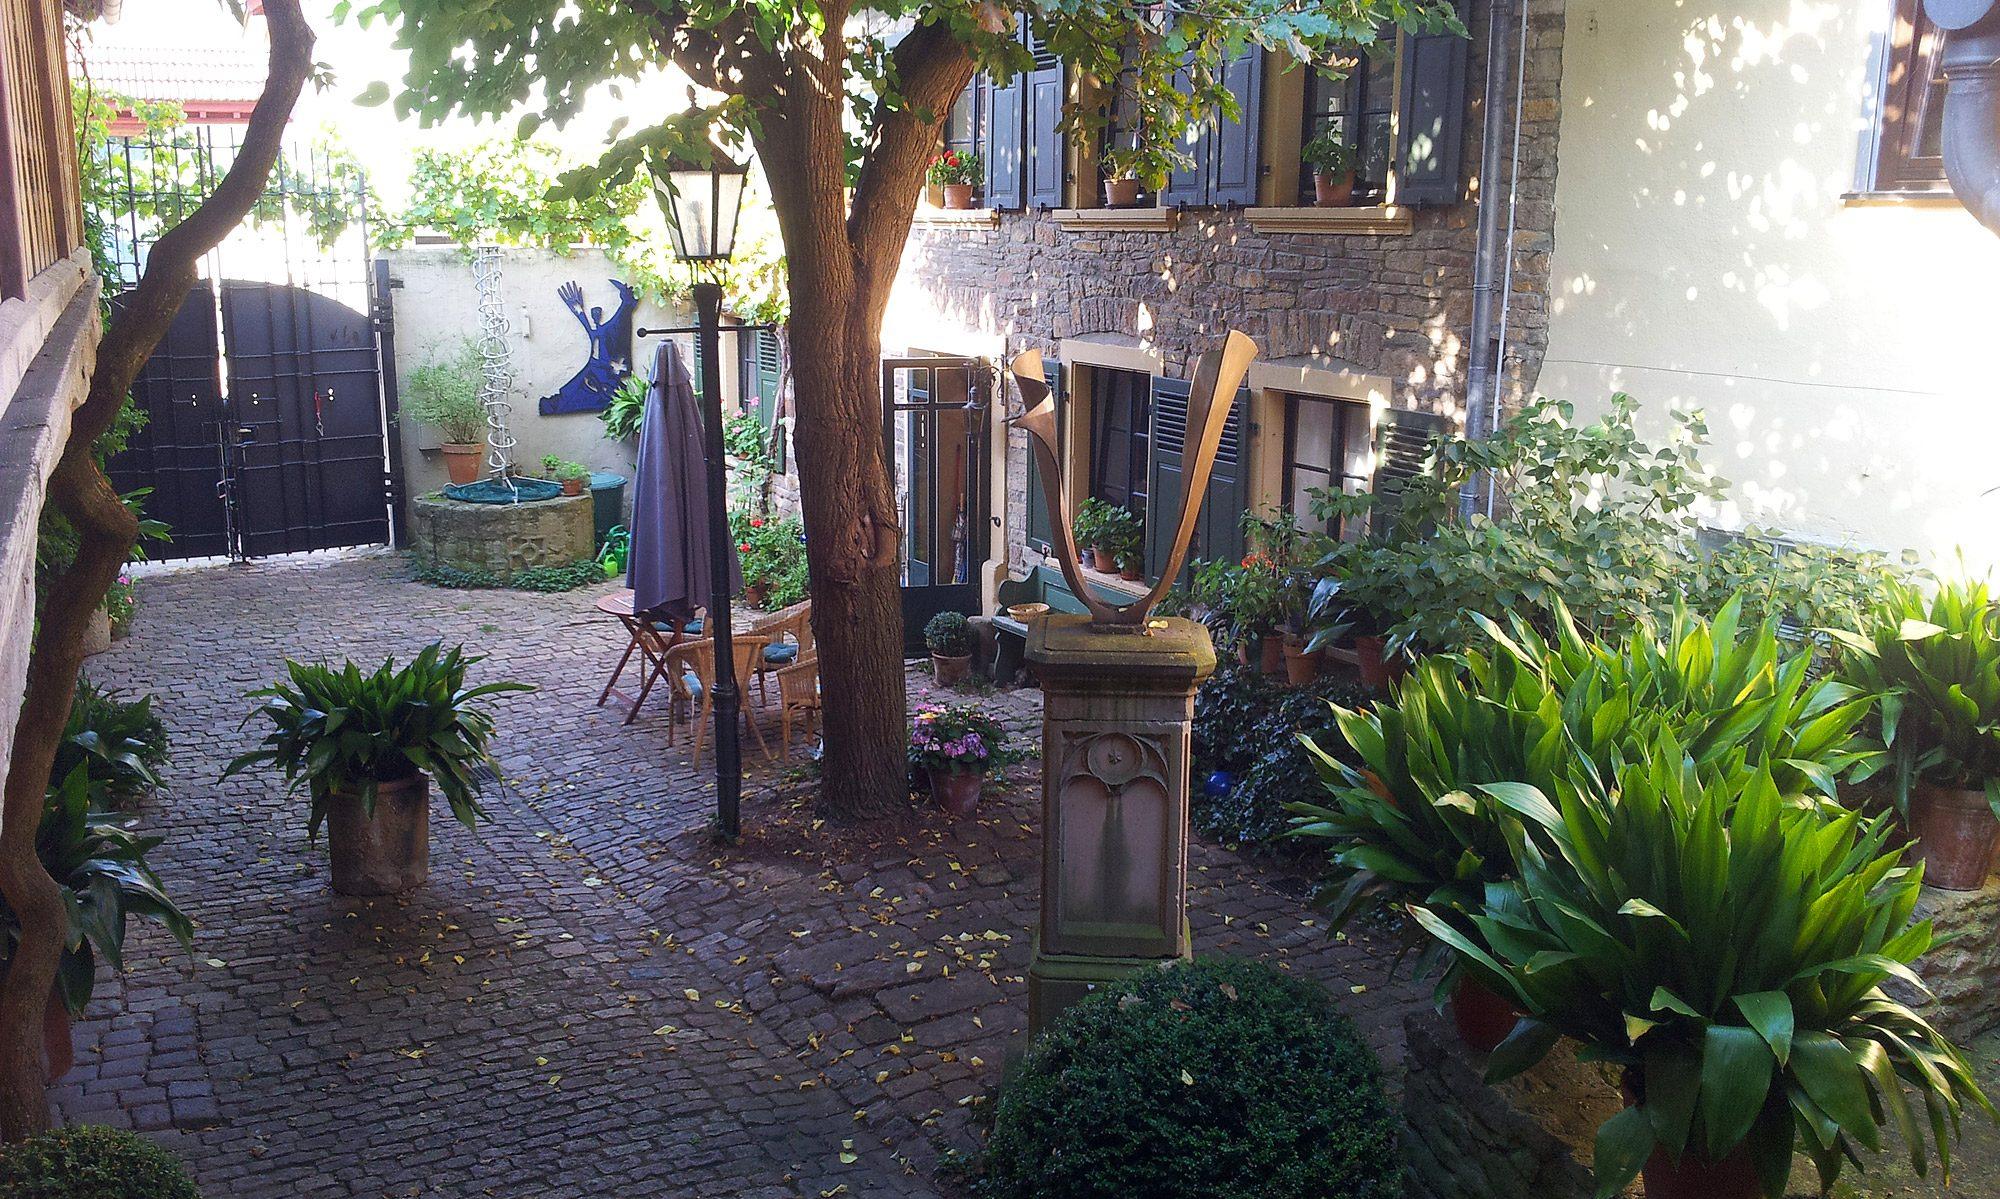 Galerie unterm Maulbeerbaum